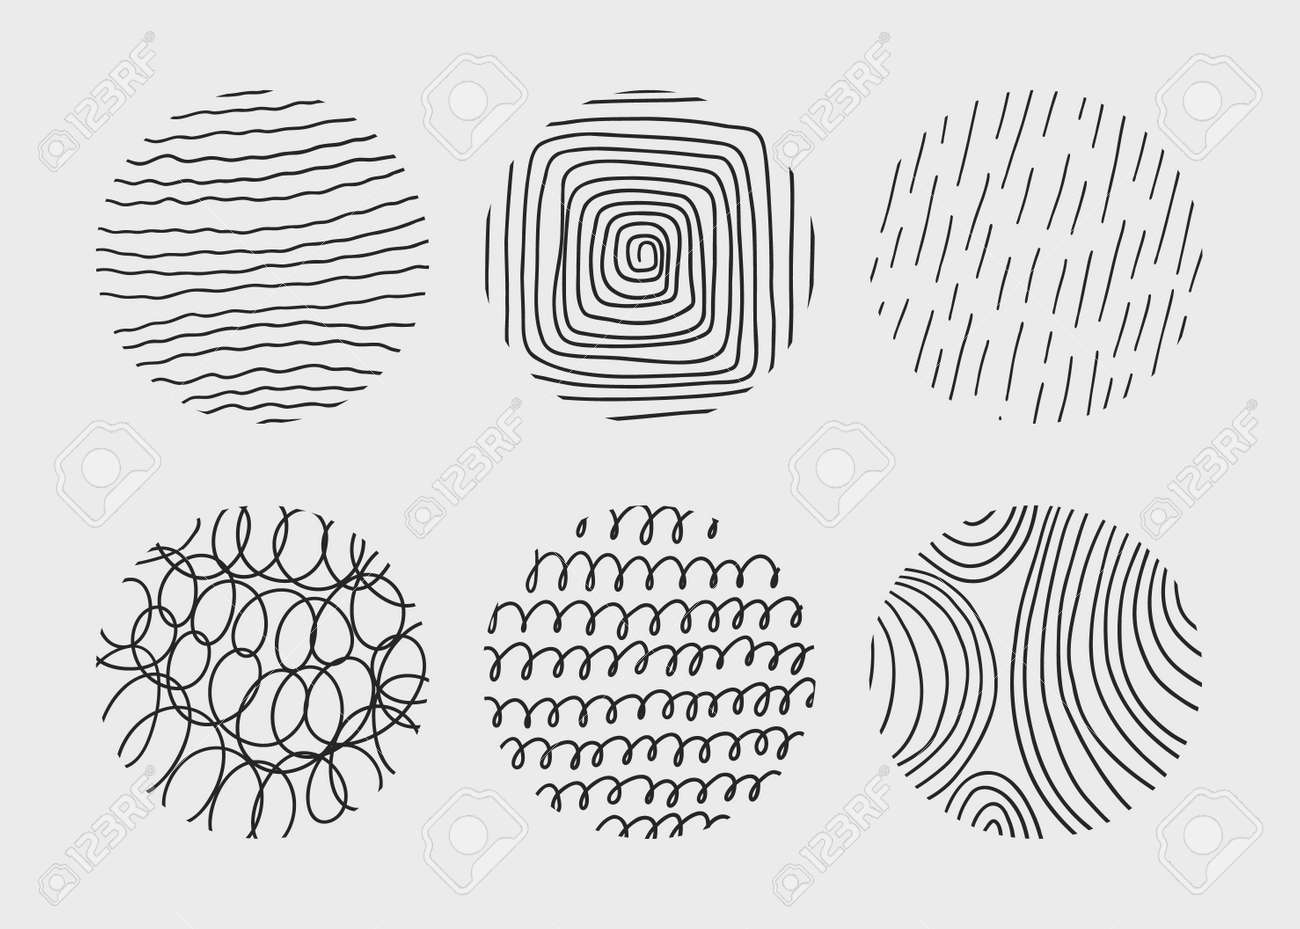 Circle creative minimalism contemporary artwork. Hand drawn doodle shapes. - 169711217